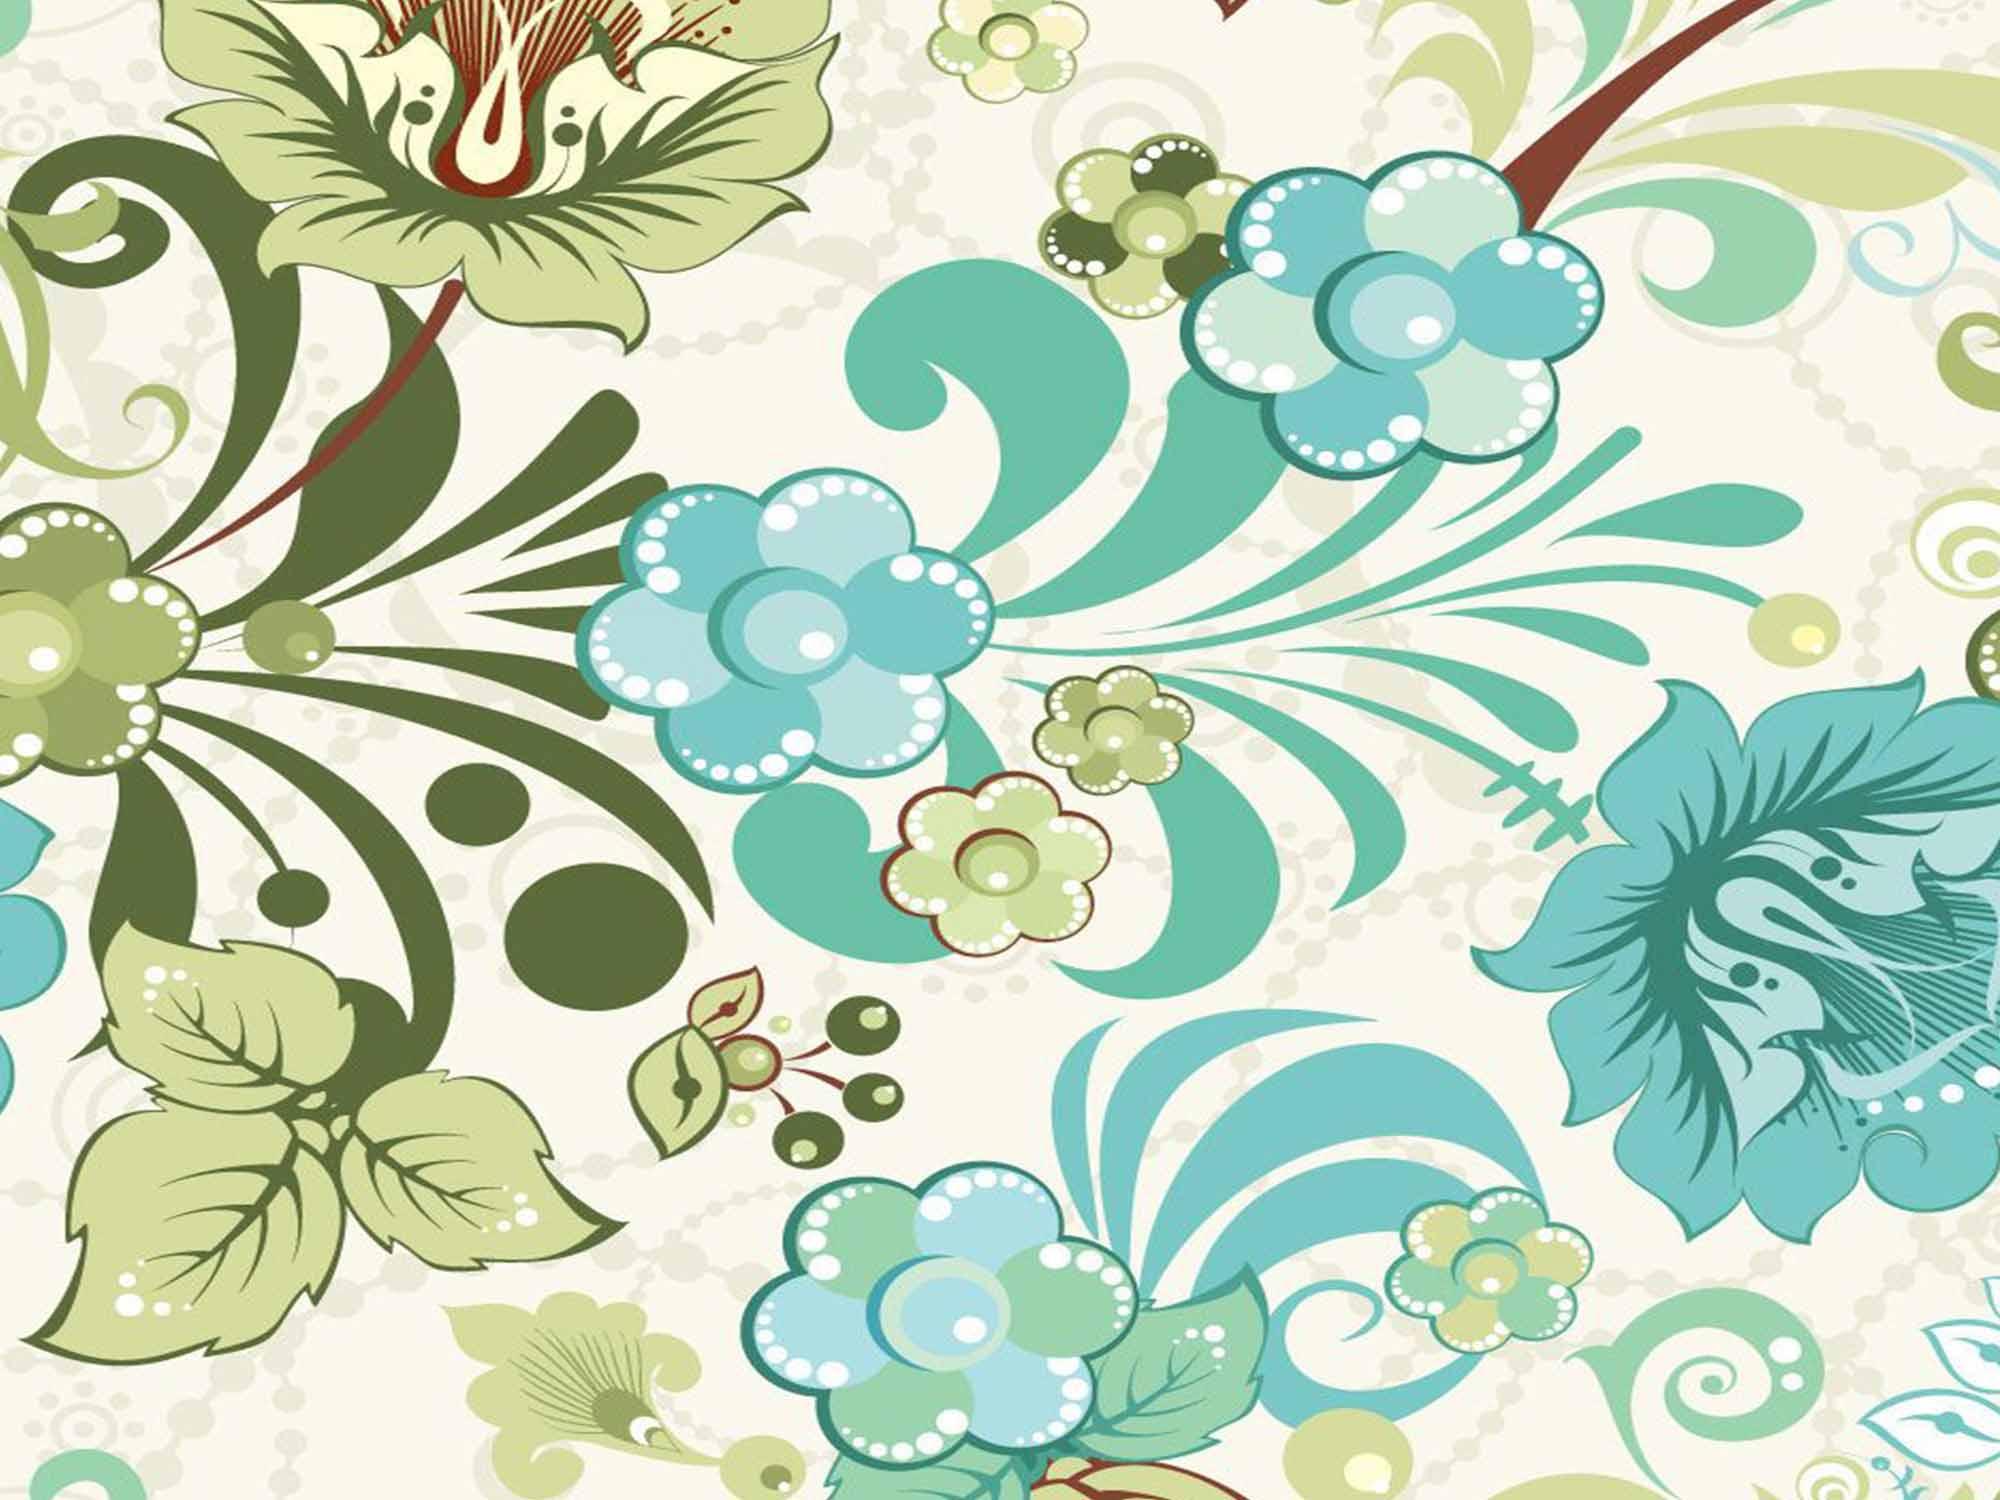 Papel de Parede Floral 0020 - Adesivos de Parede  - Paredes Decoradas